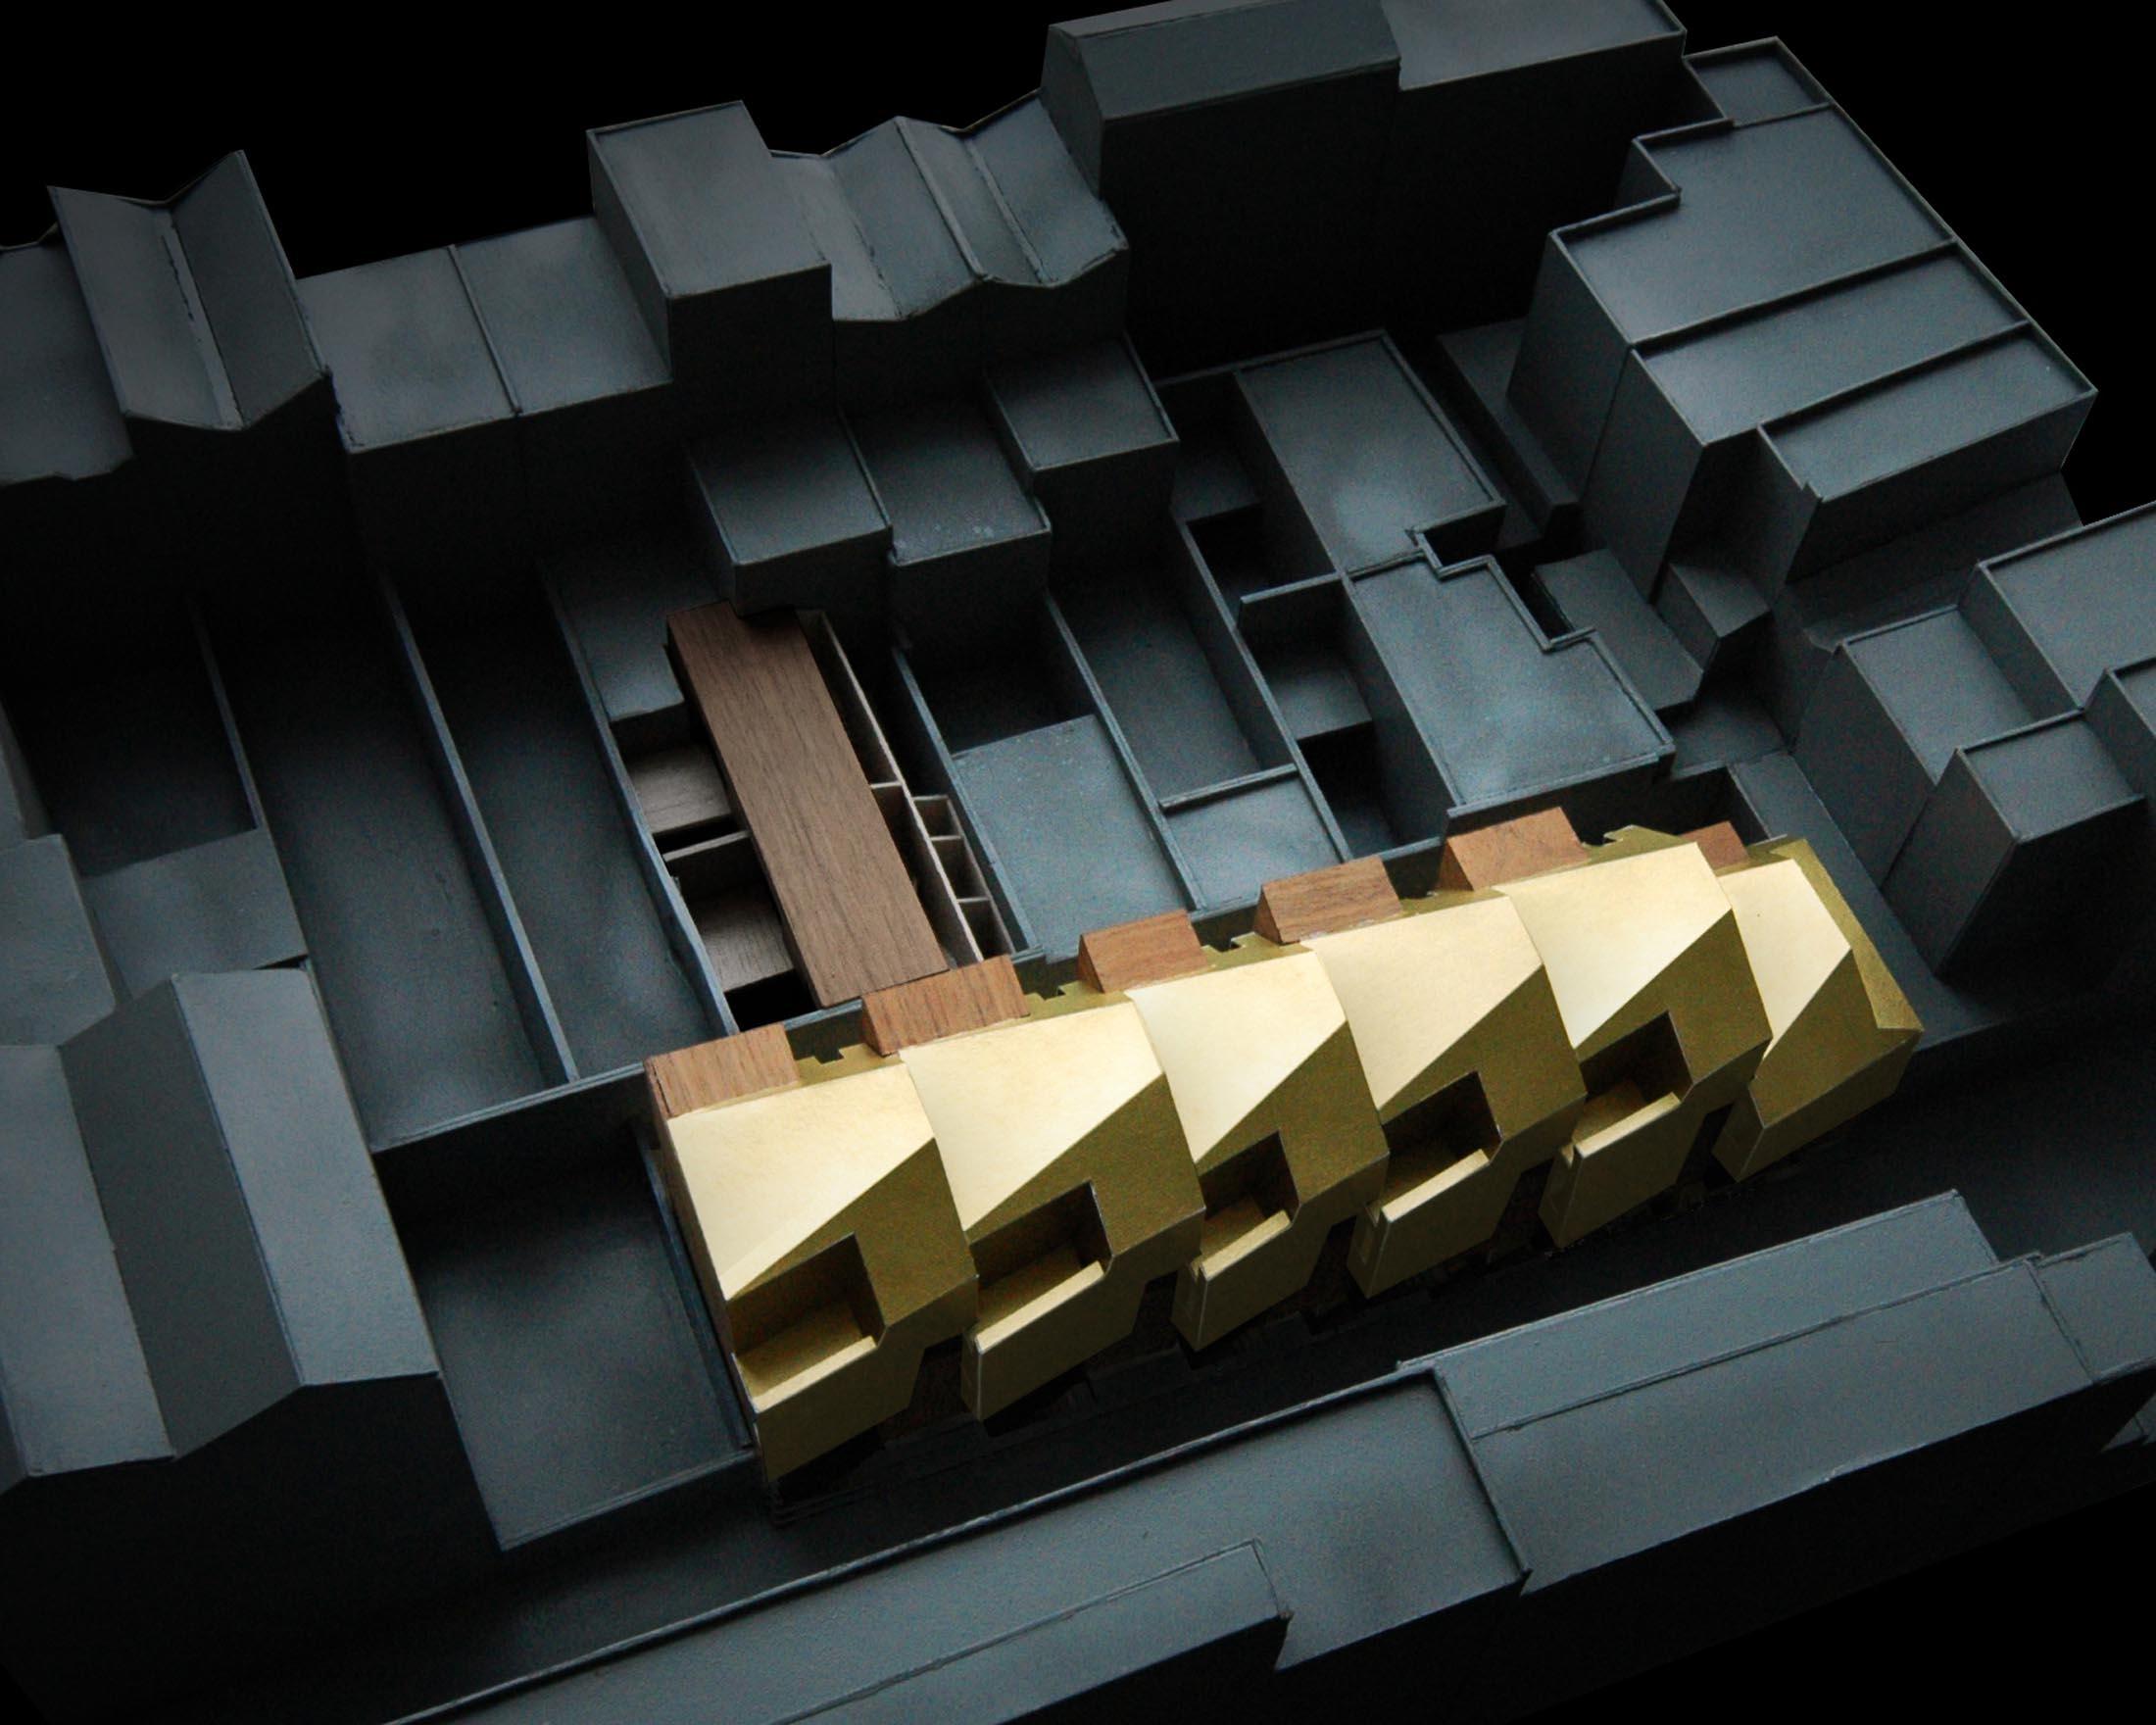 godson-street-model-5-quality-6.jpg